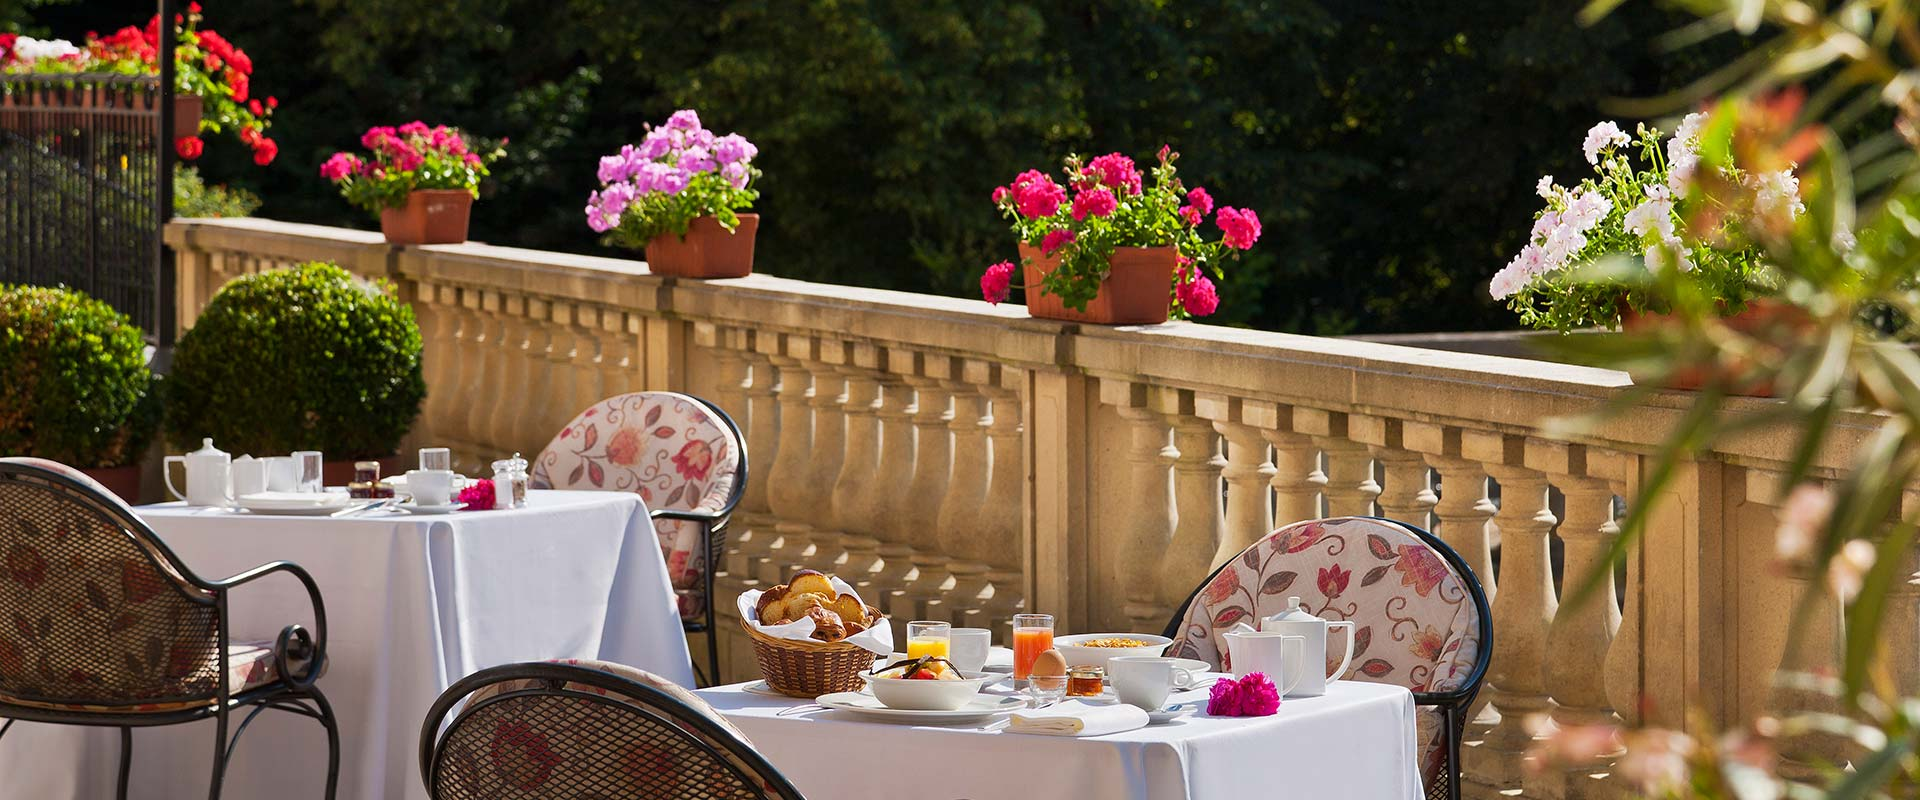 restaurant-gastronomique-terrasse